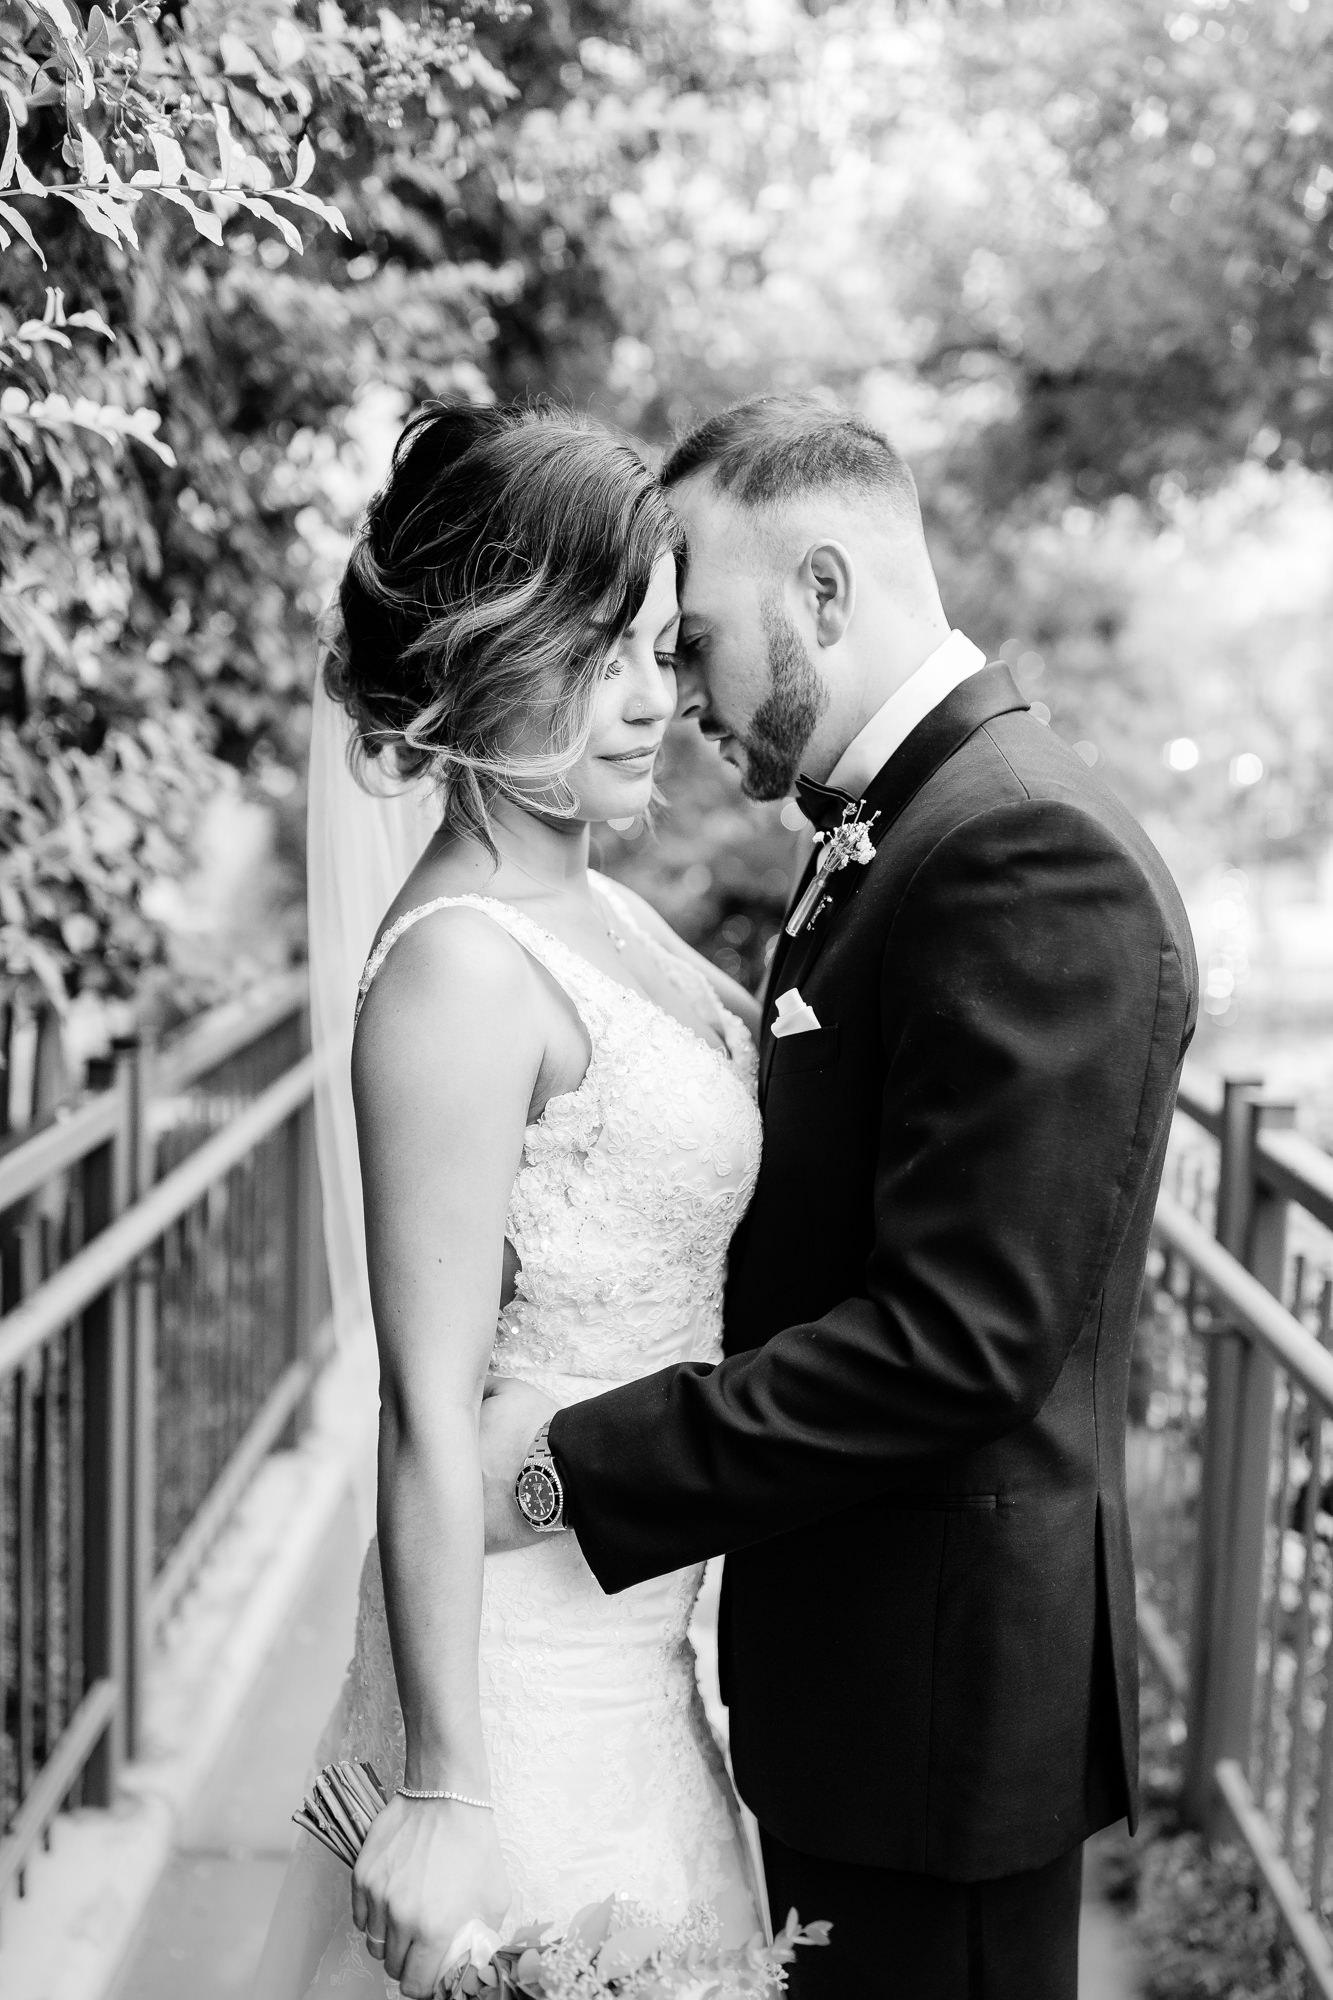 Anthony & Nicole's Wedding_216302.jpg